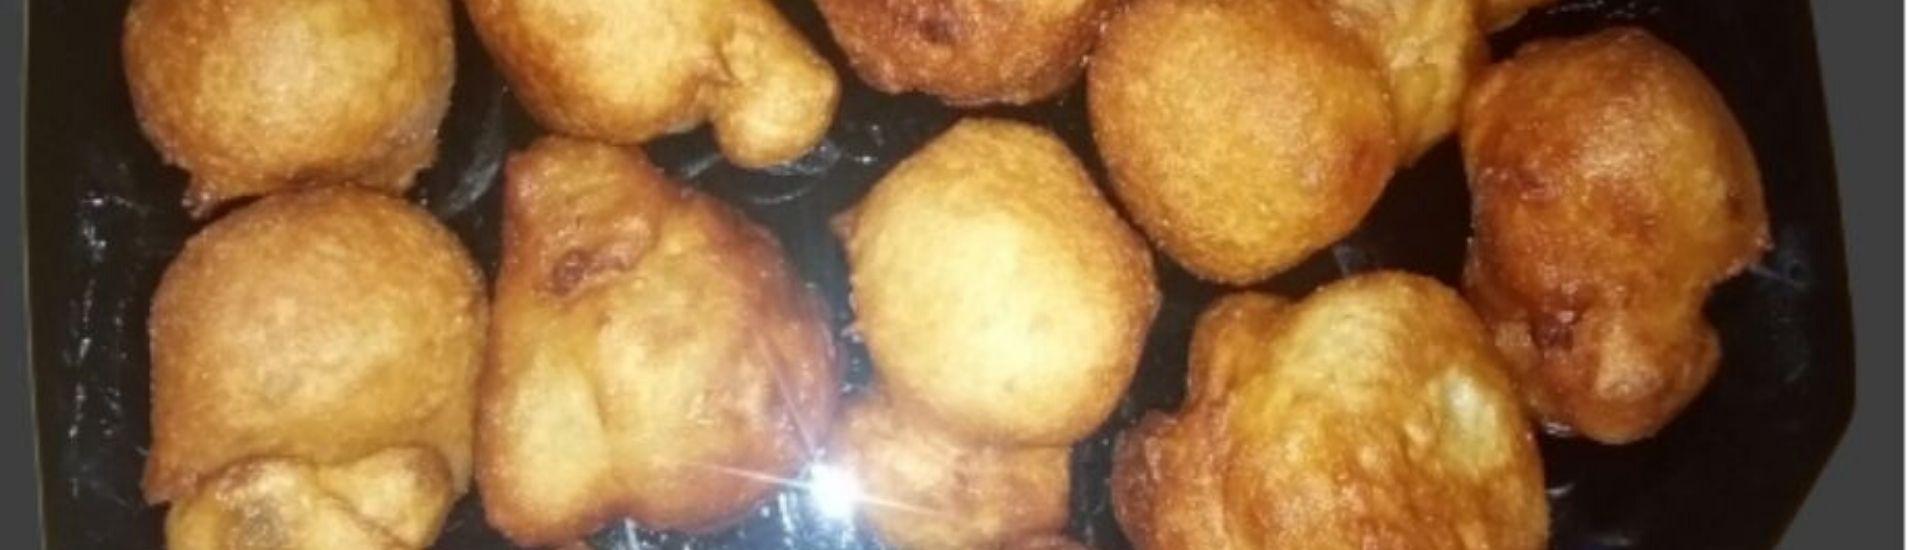 Recette vidéo beignets de farine - Dzaleu+mag